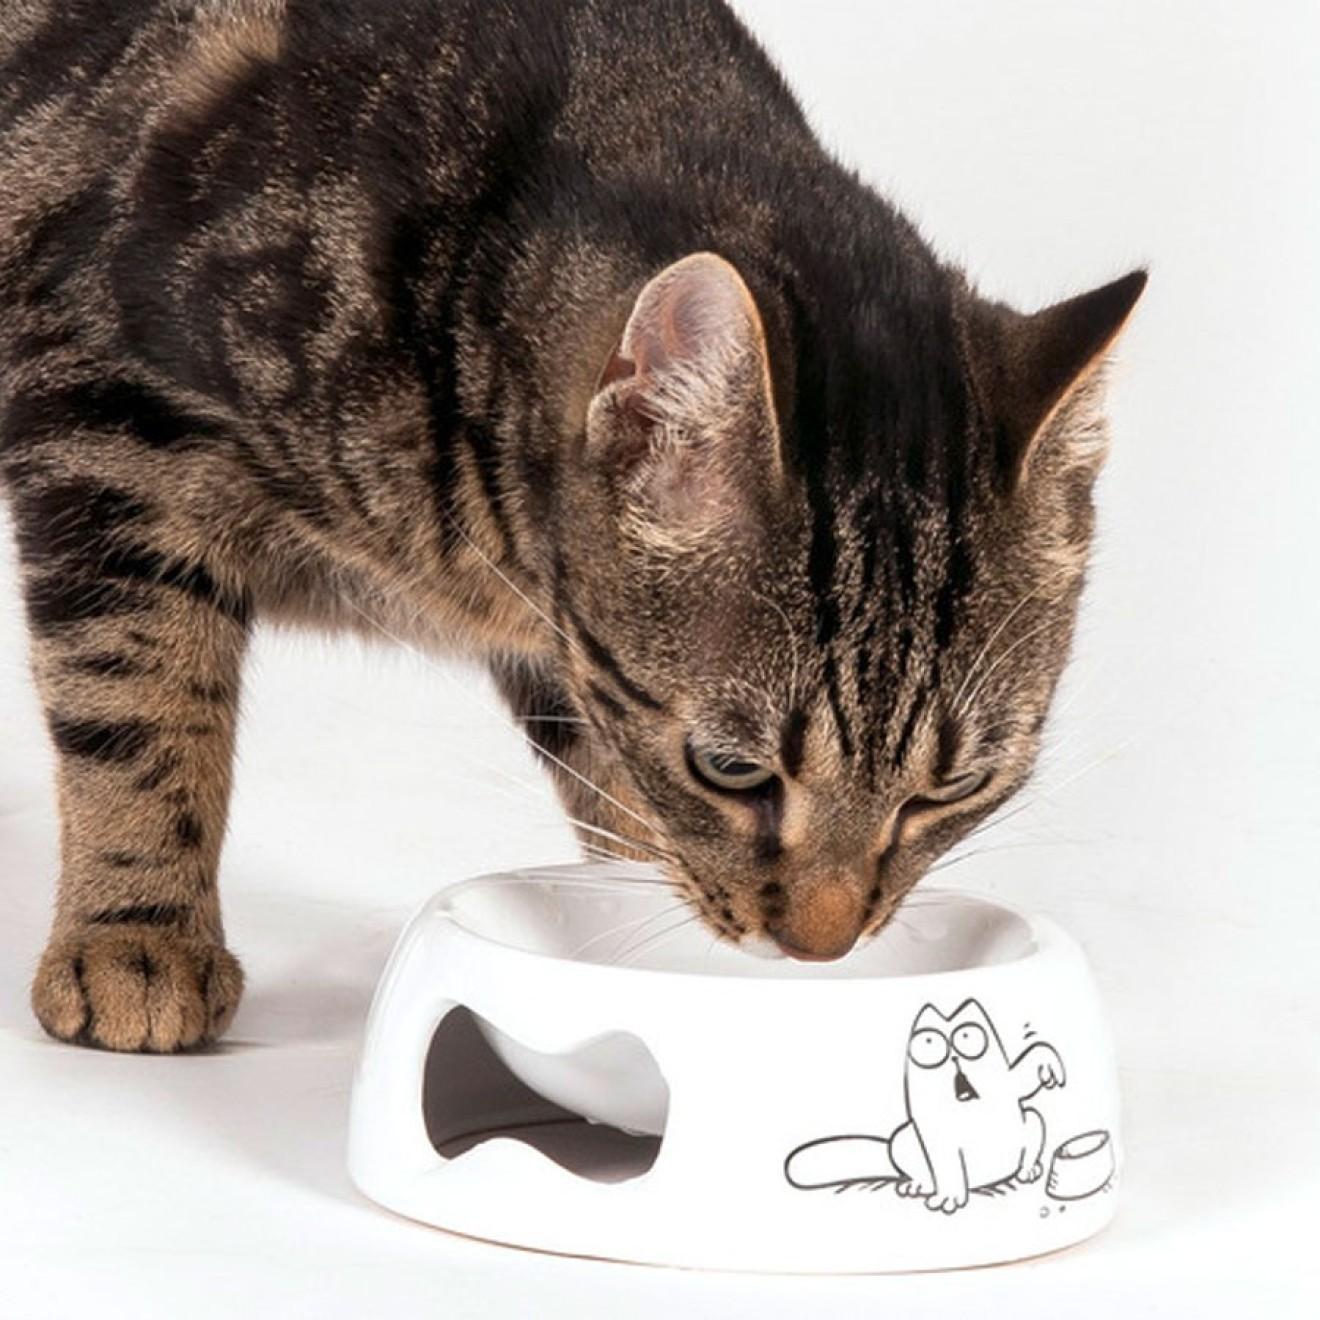 keramik katzennapf simons cat katzen futternapf katzenn pfe. Black Bedroom Furniture Sets. Home Design Ideas